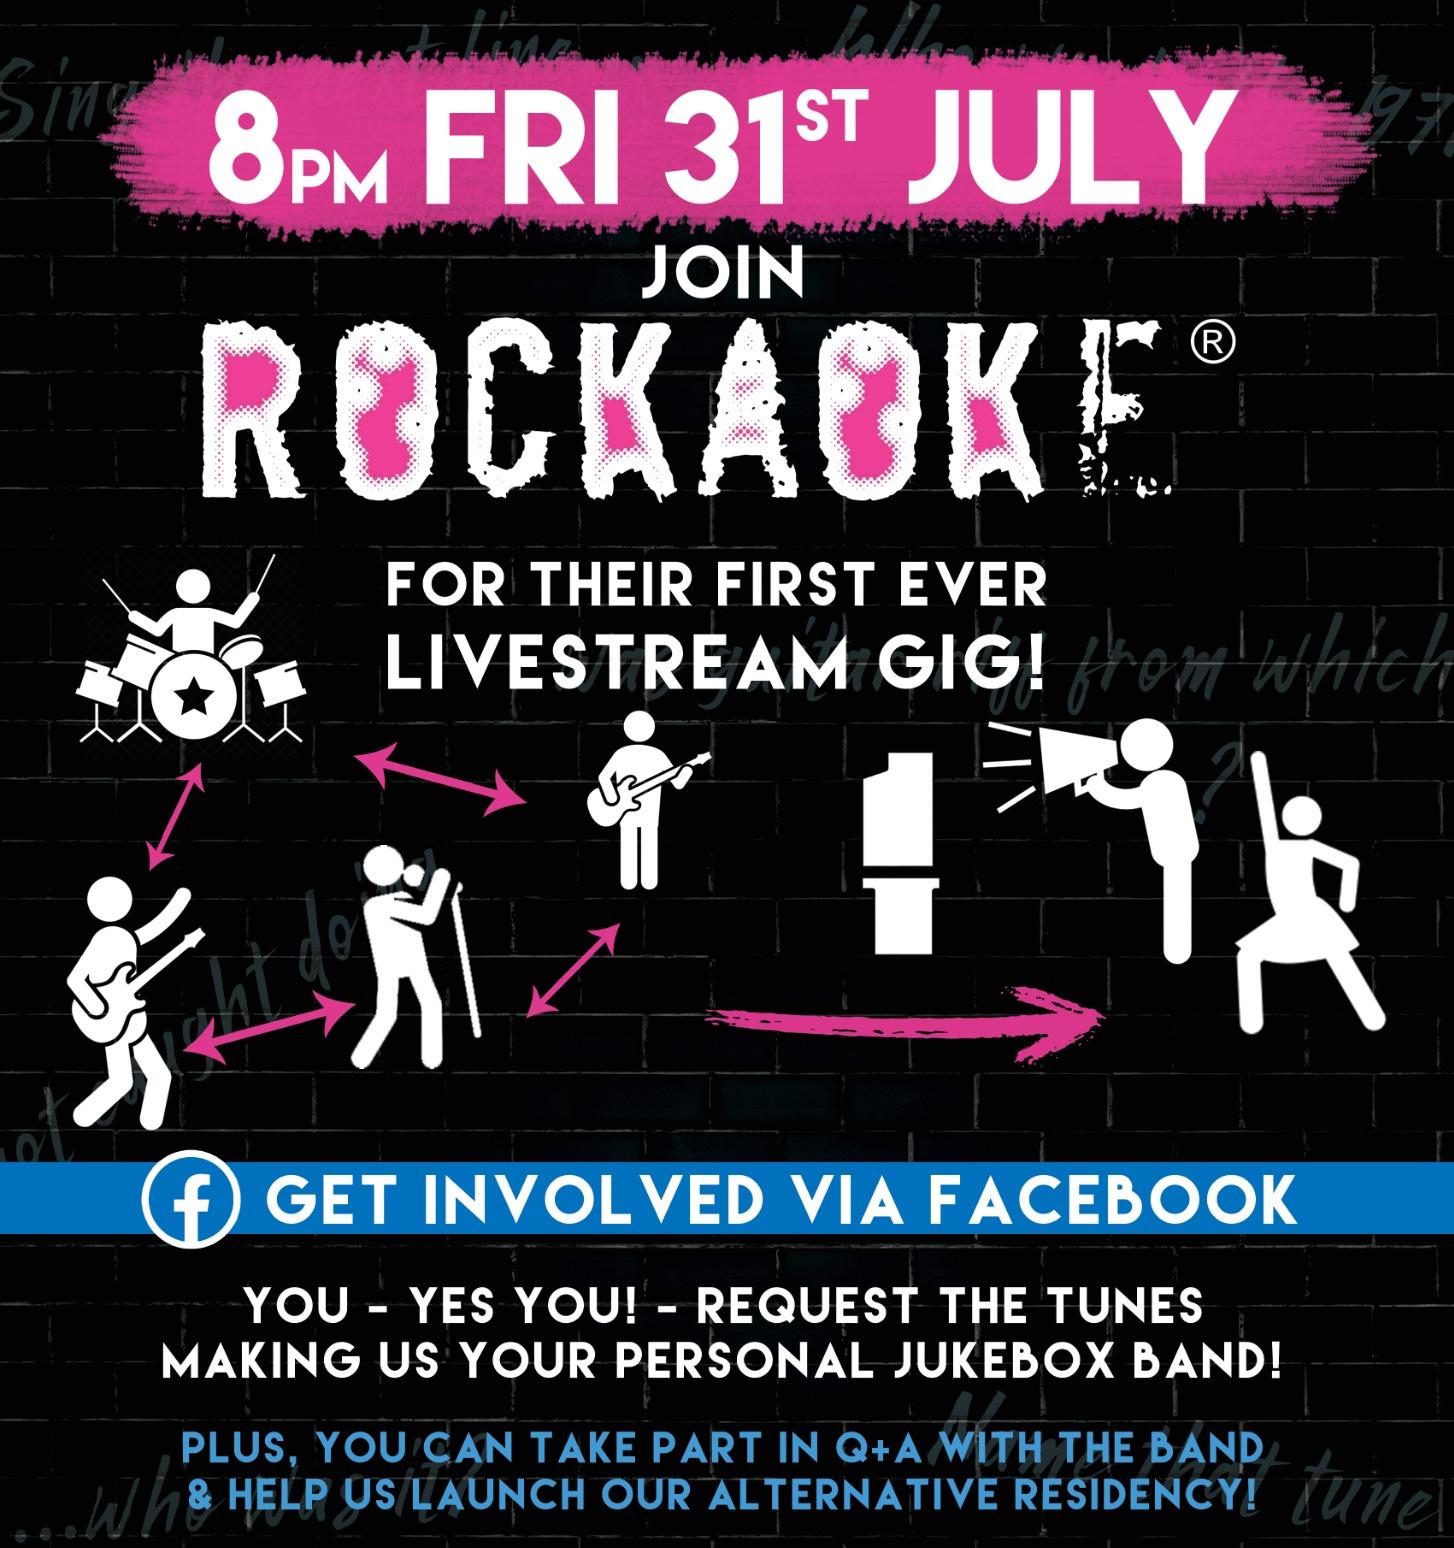 Rockaoke livestream gig flyer 31 july 2020